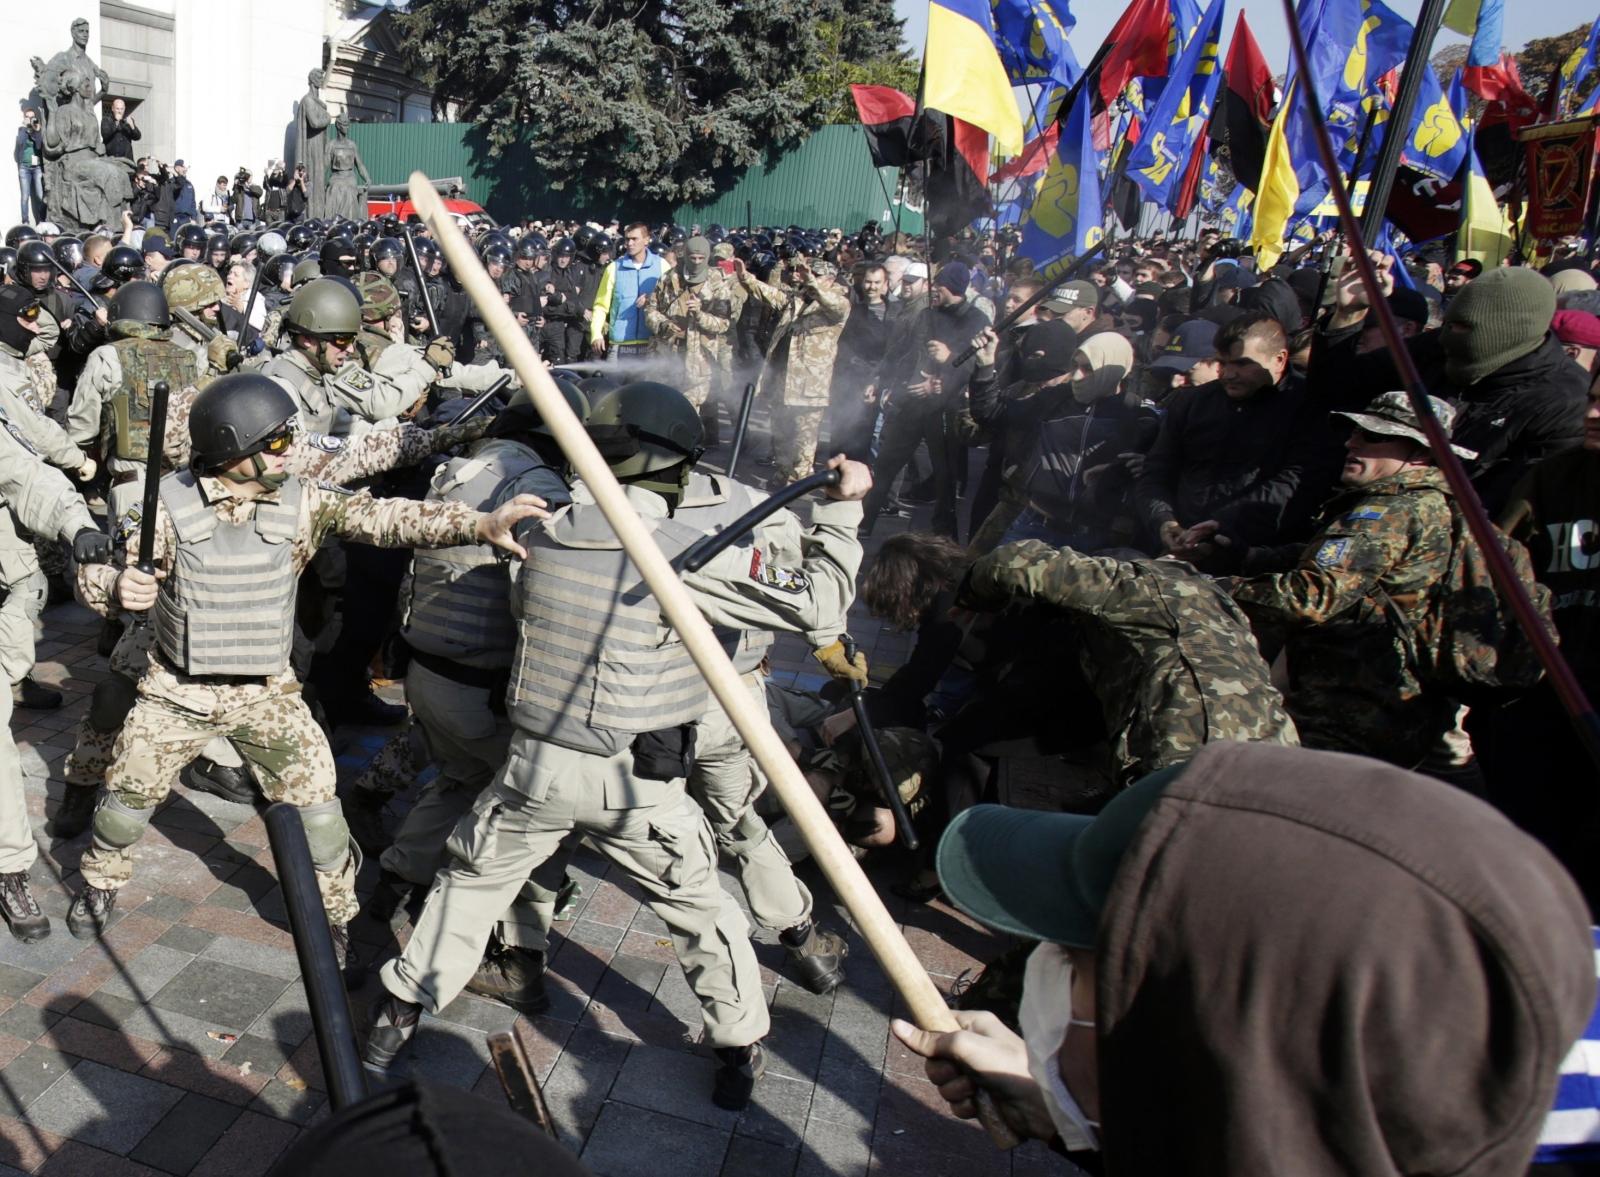 Ukraine riot police protesters violence clash